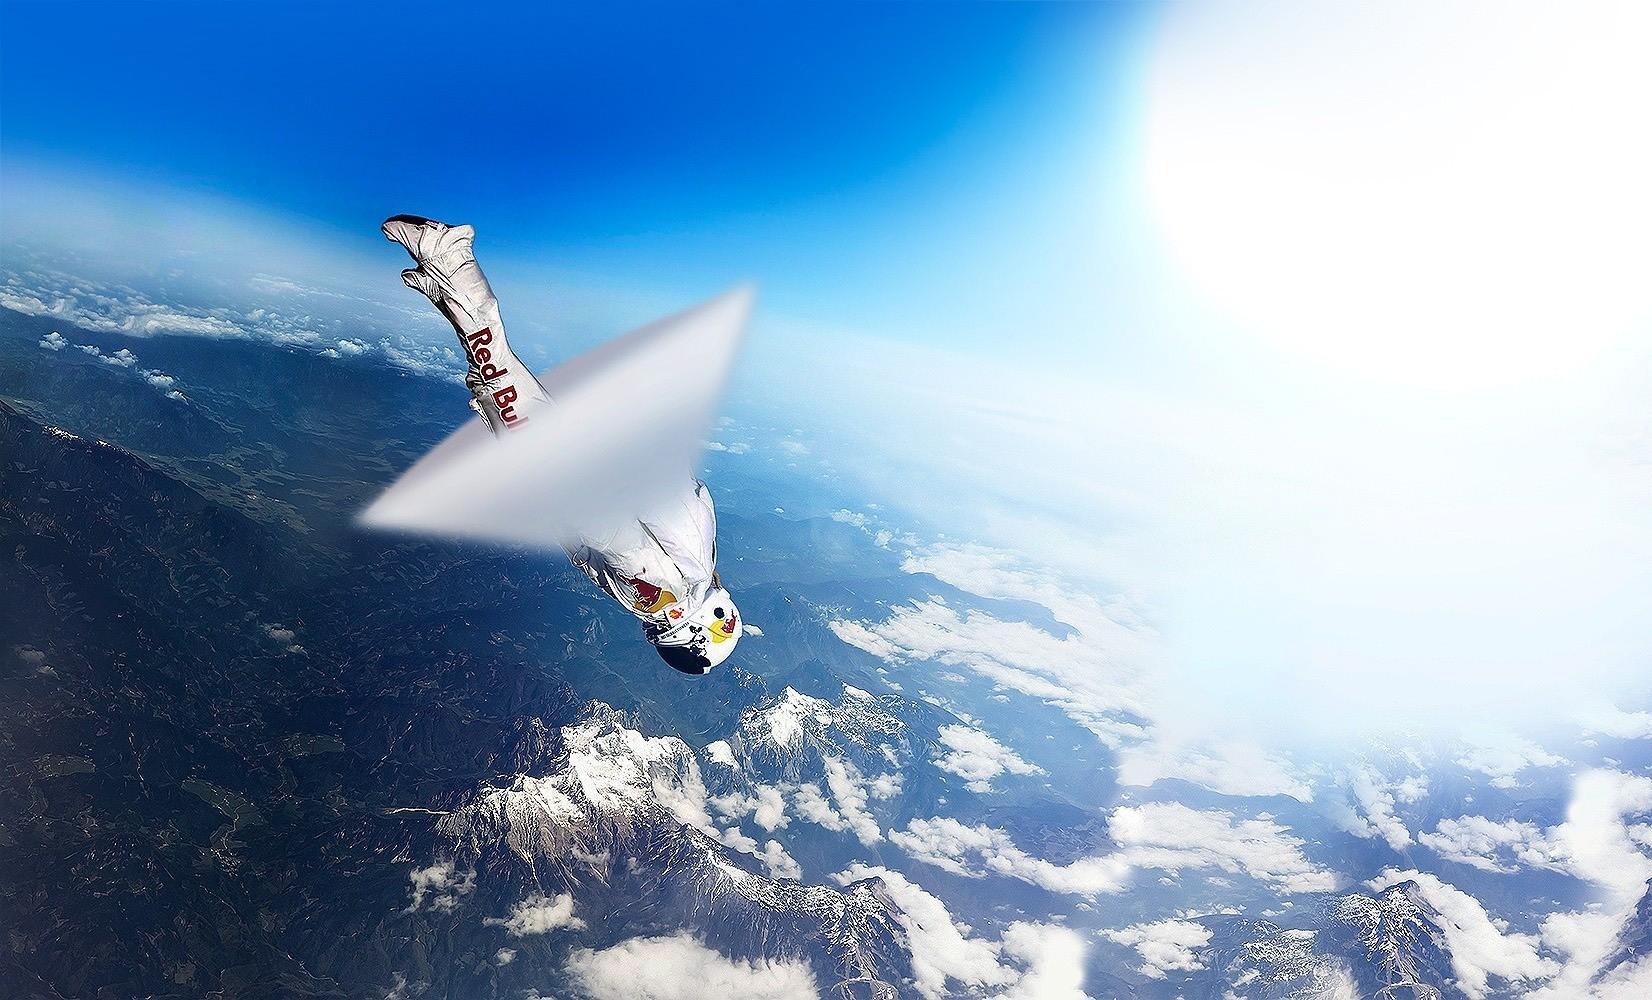 mission-redbull-stratos-2